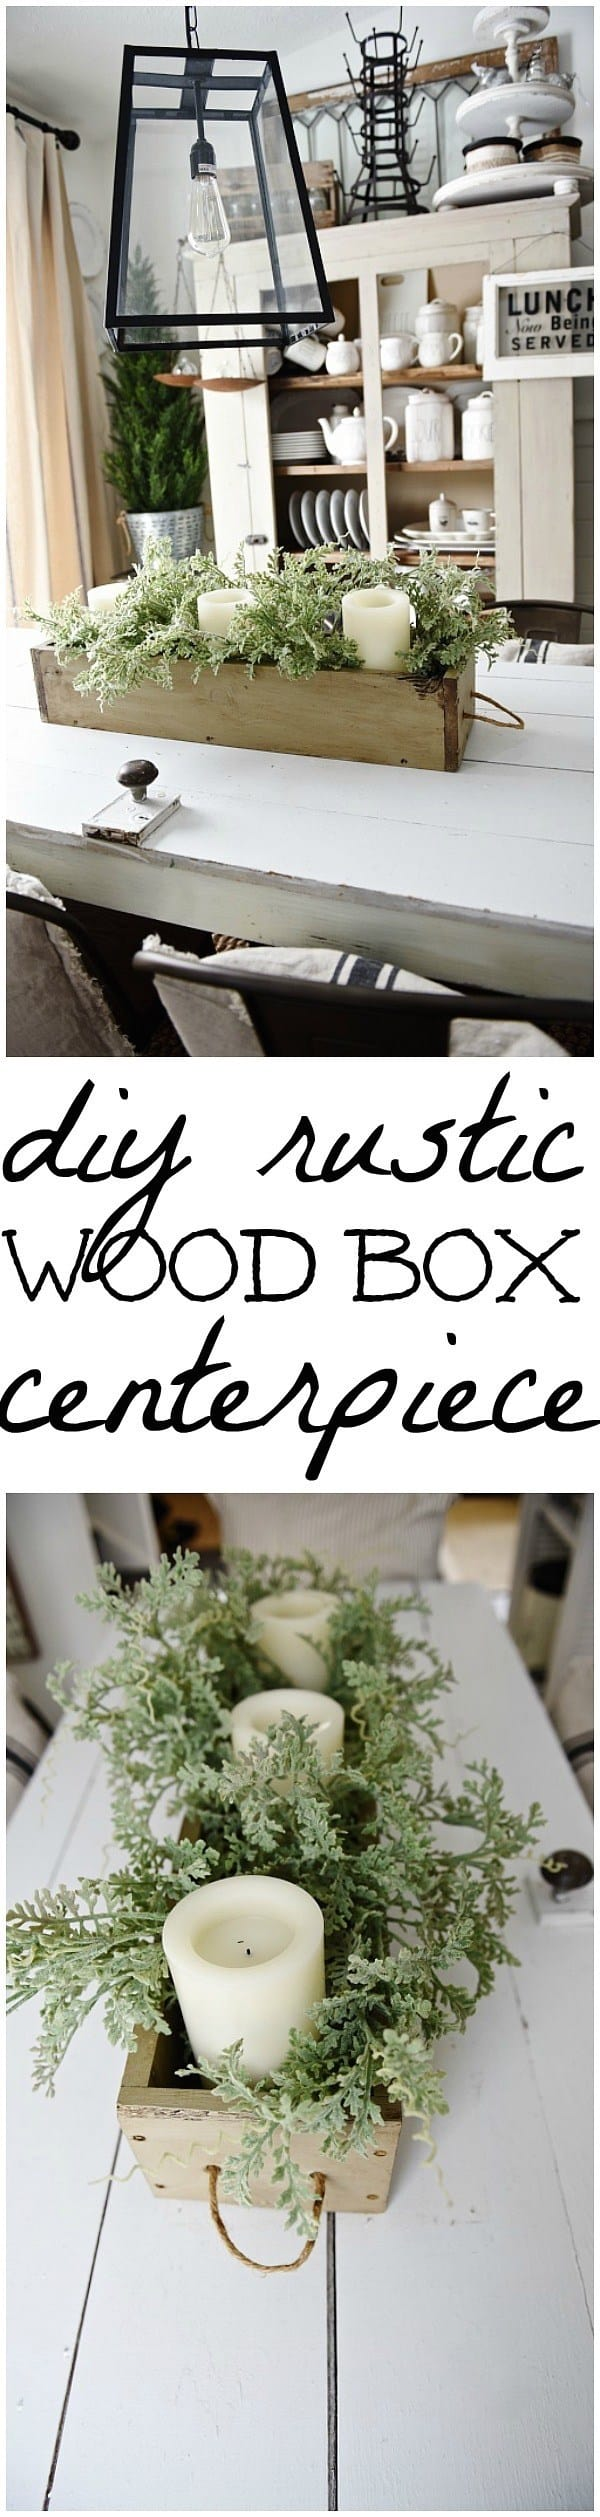 Diy rustic wood boc centrepiece